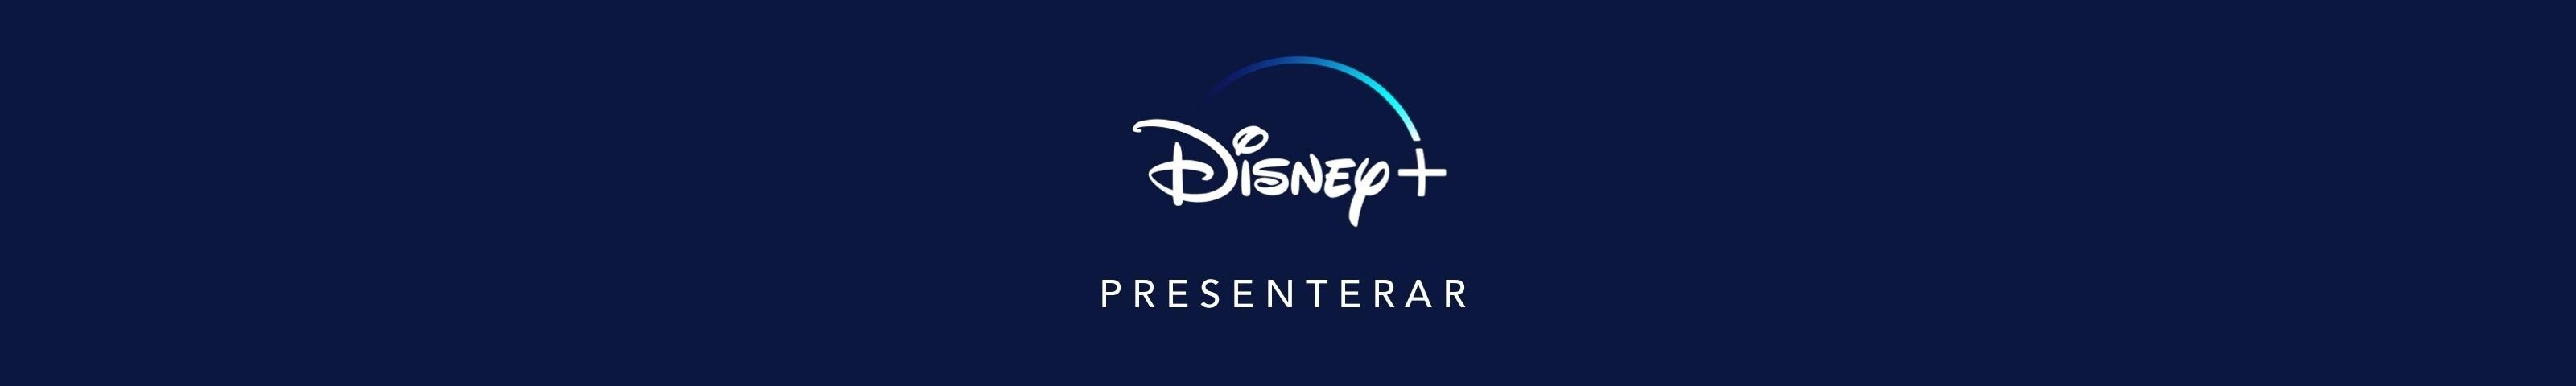 Disney+ presenterar